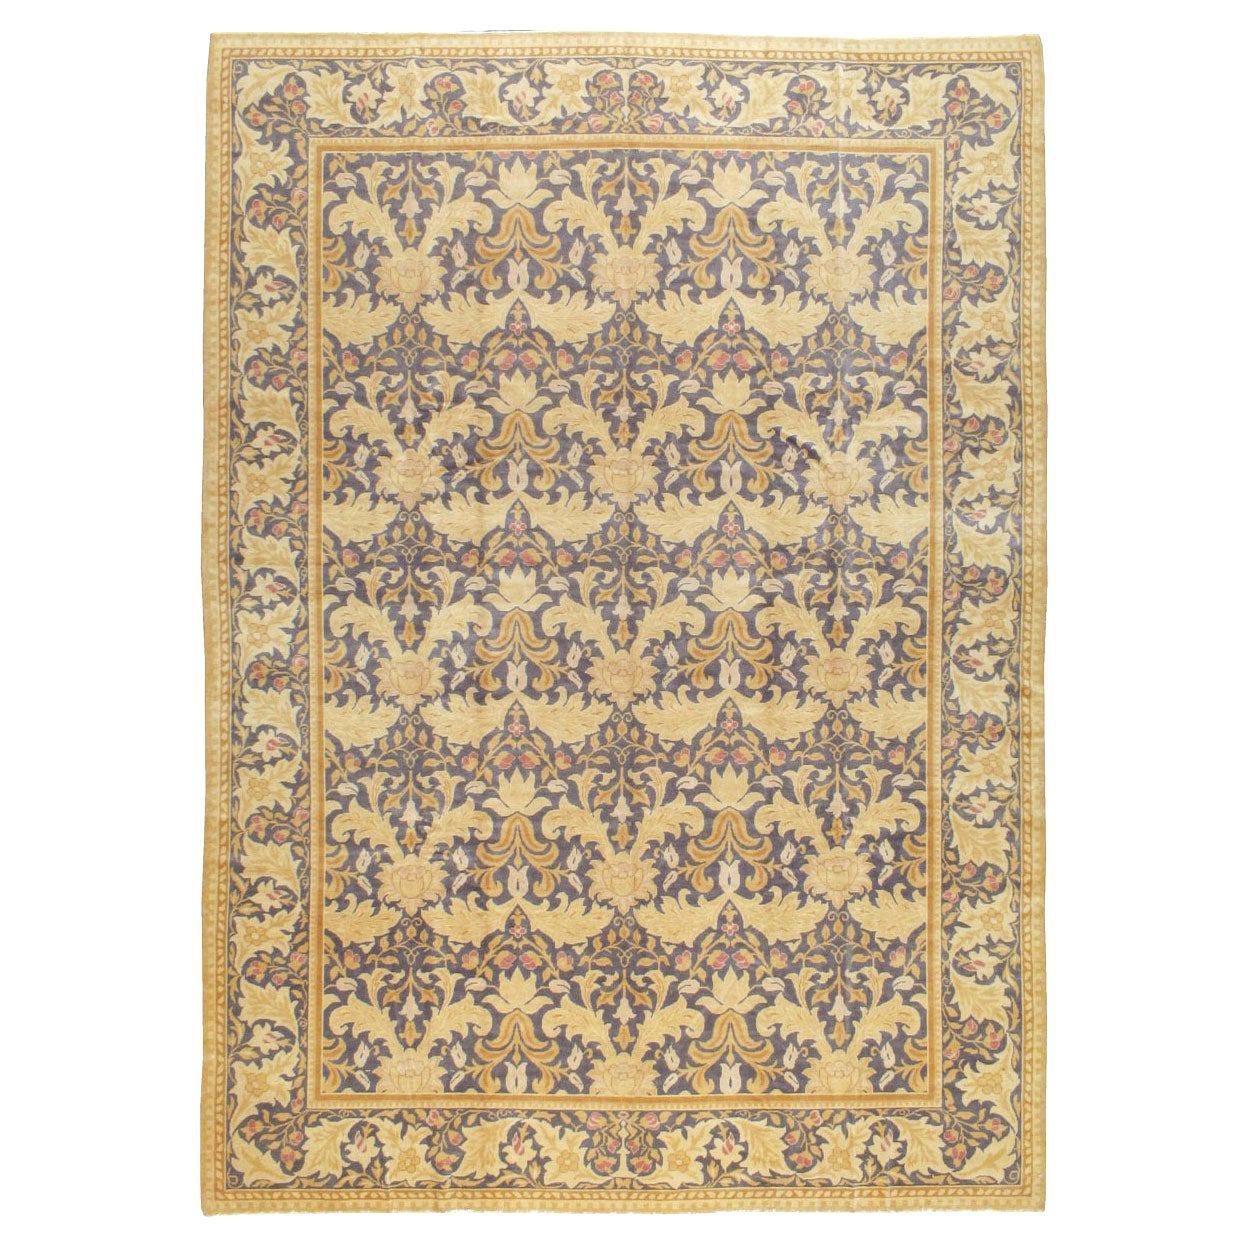 Contemporary Handmade Spanish Arts & Crafts Cuenca Room Size Carpet